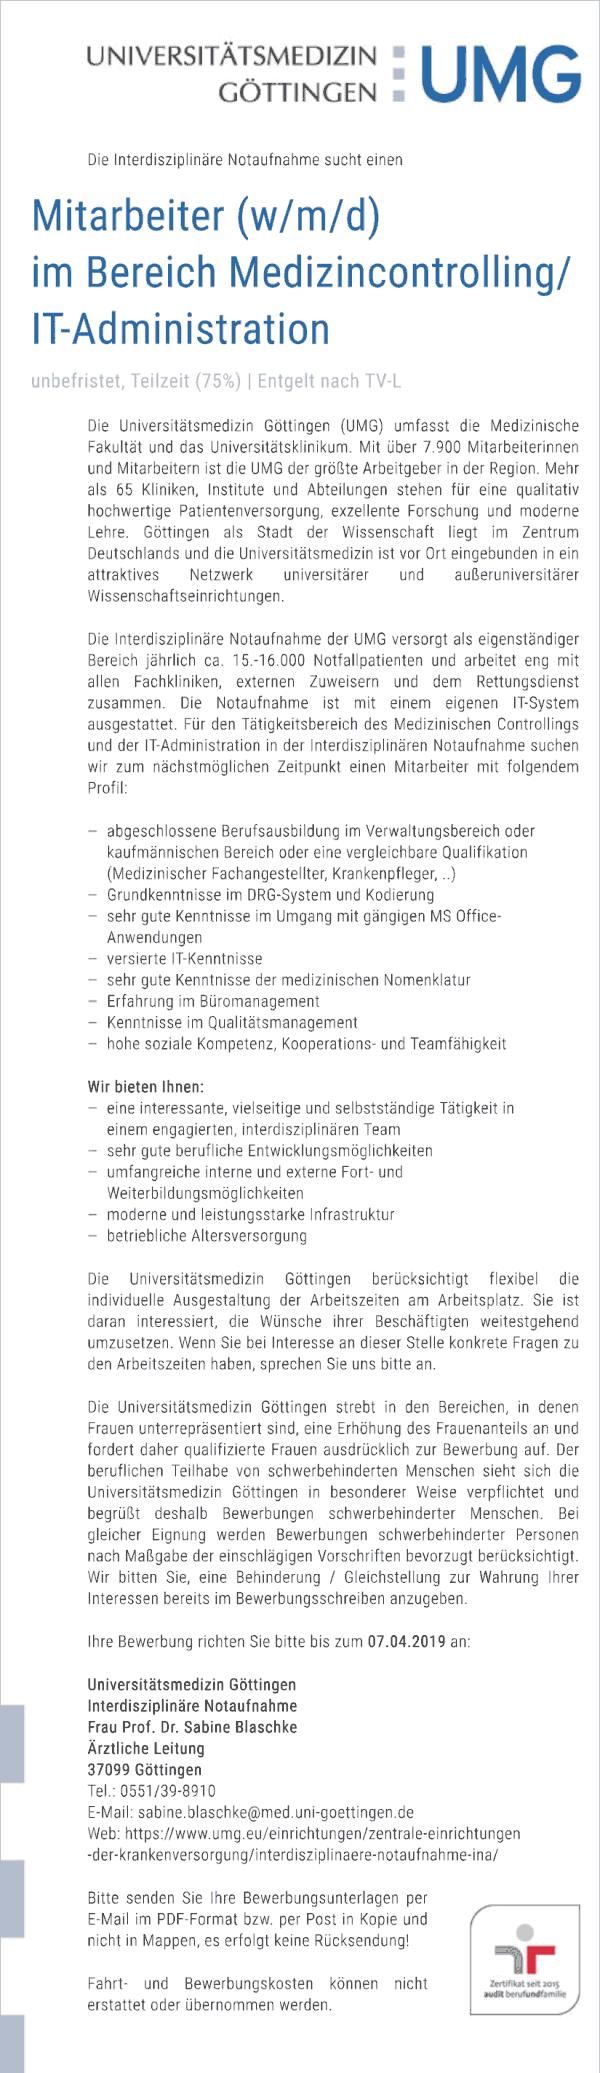 Universitätsmedizin Göttingen: Mitarbeiter Medizincontrolling / IT-Administration (w/m/d)